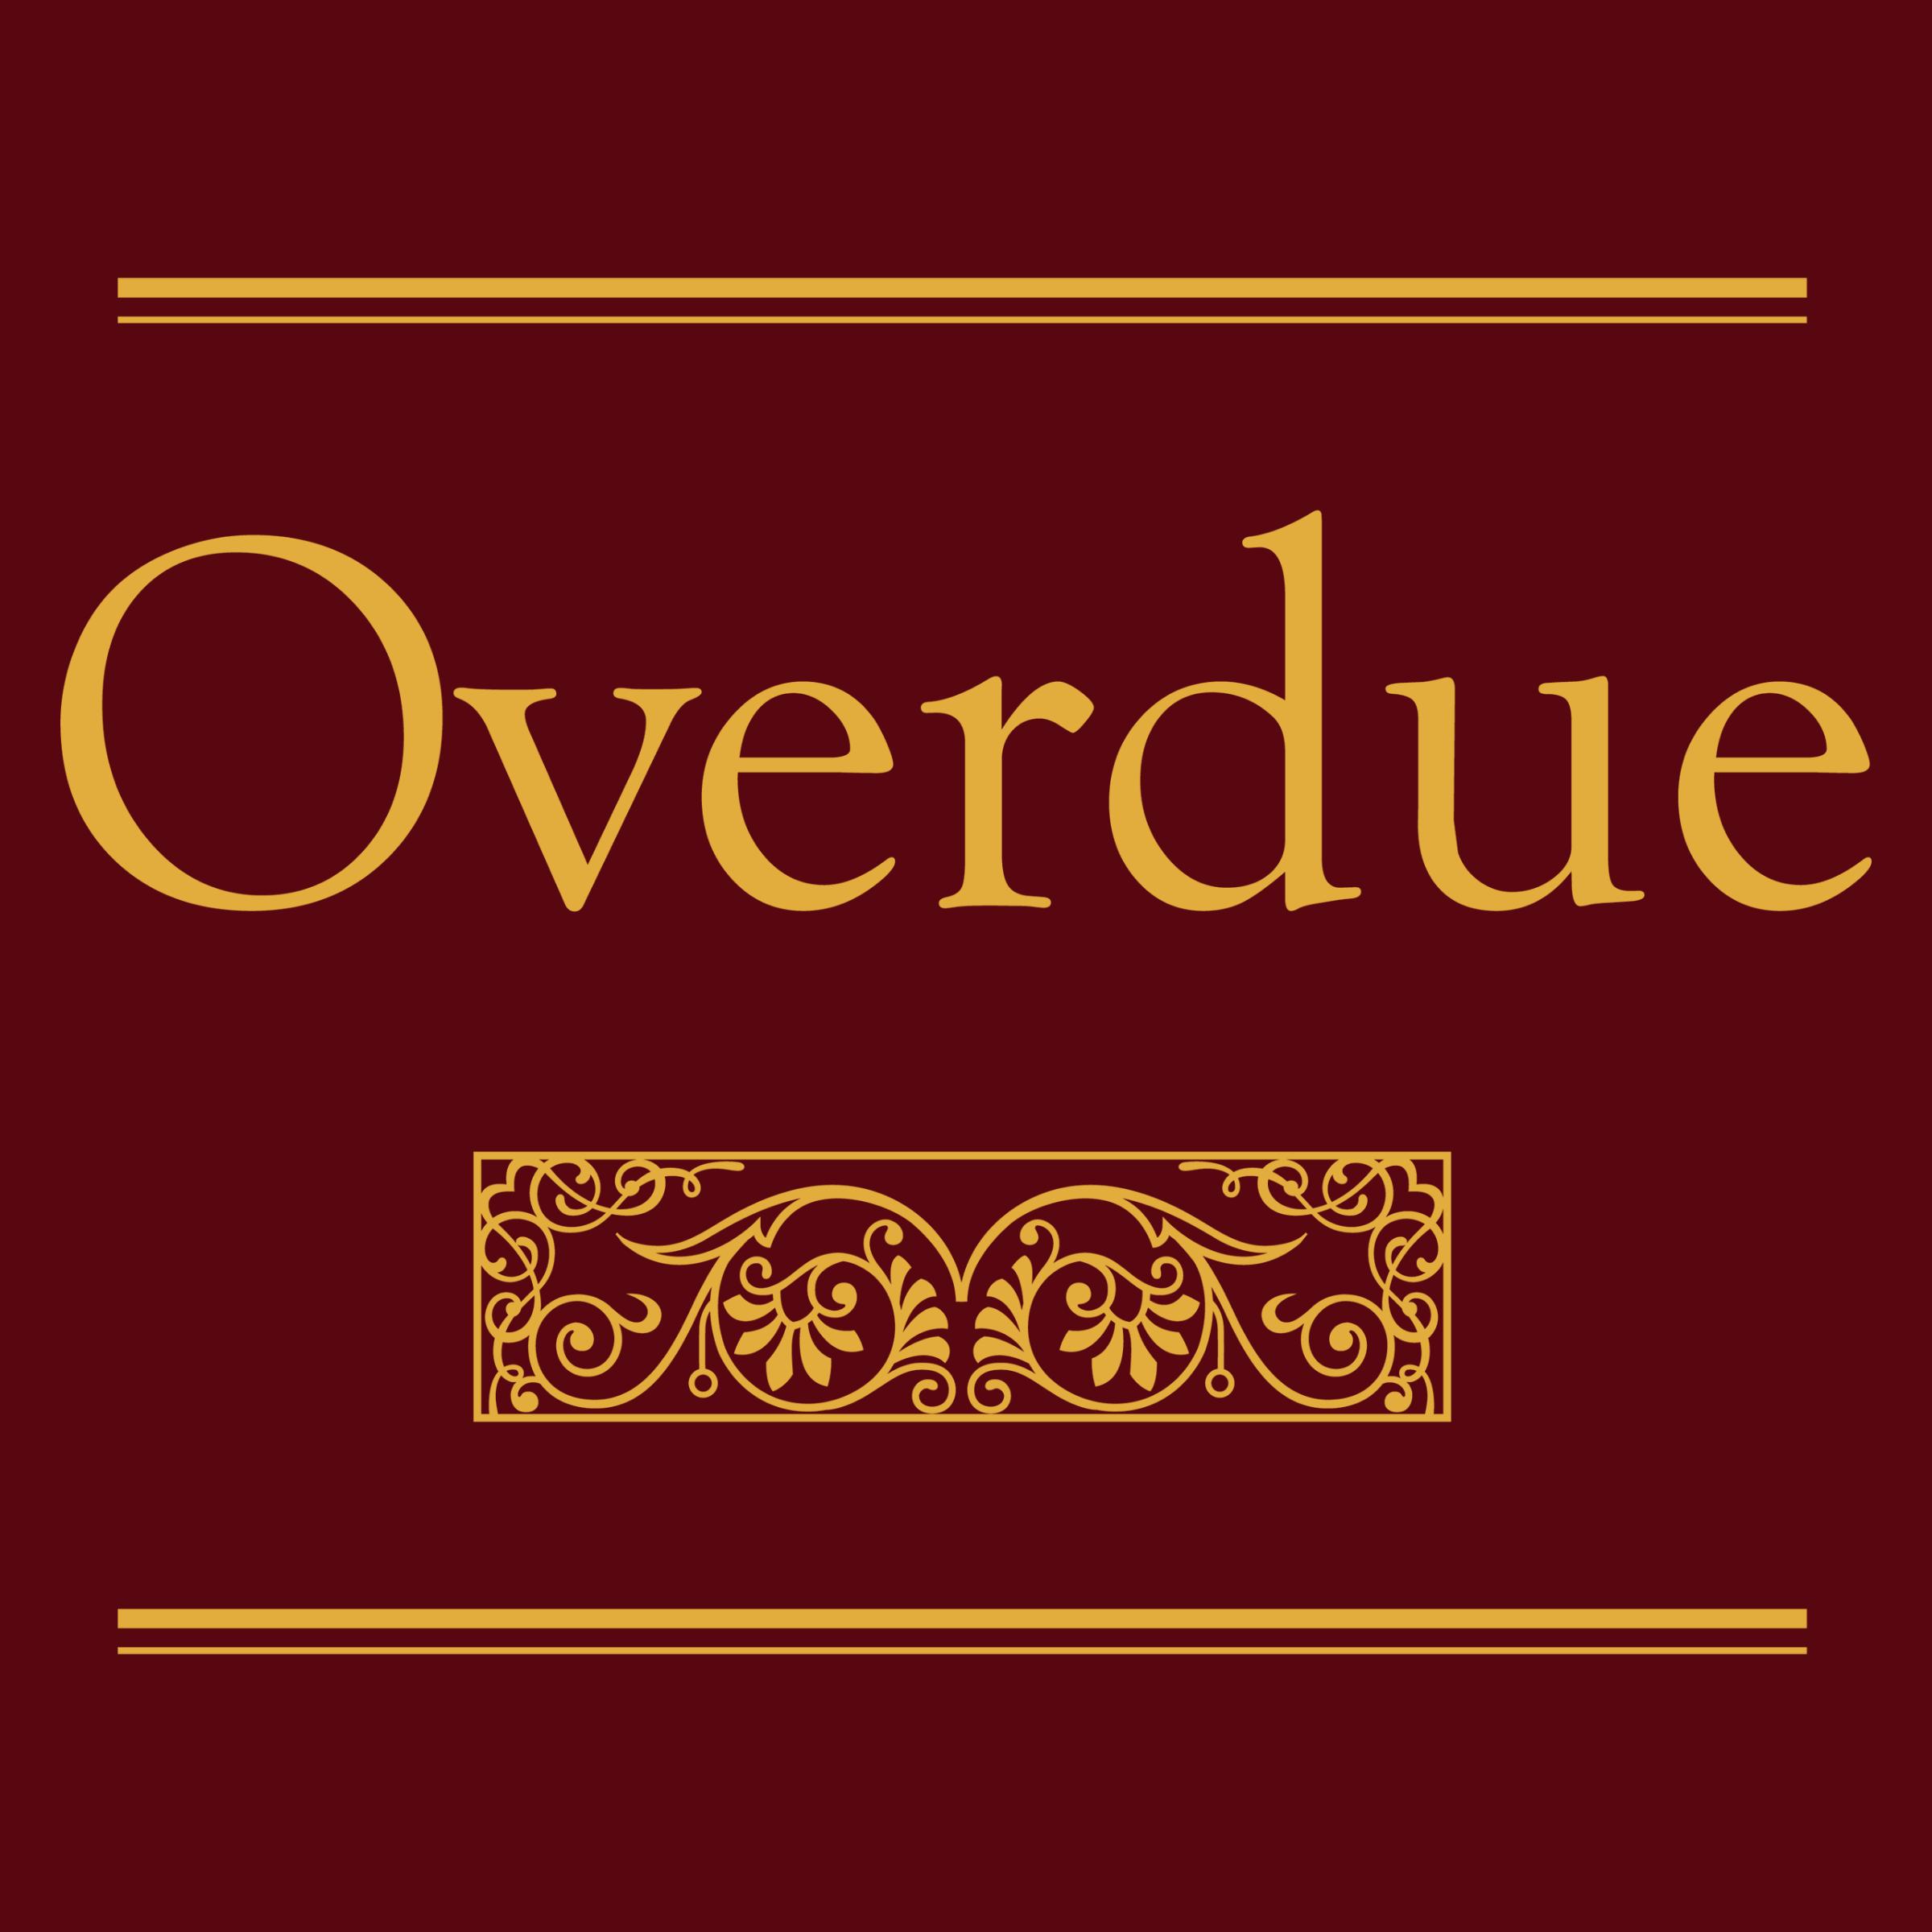 Overdue logo shirt